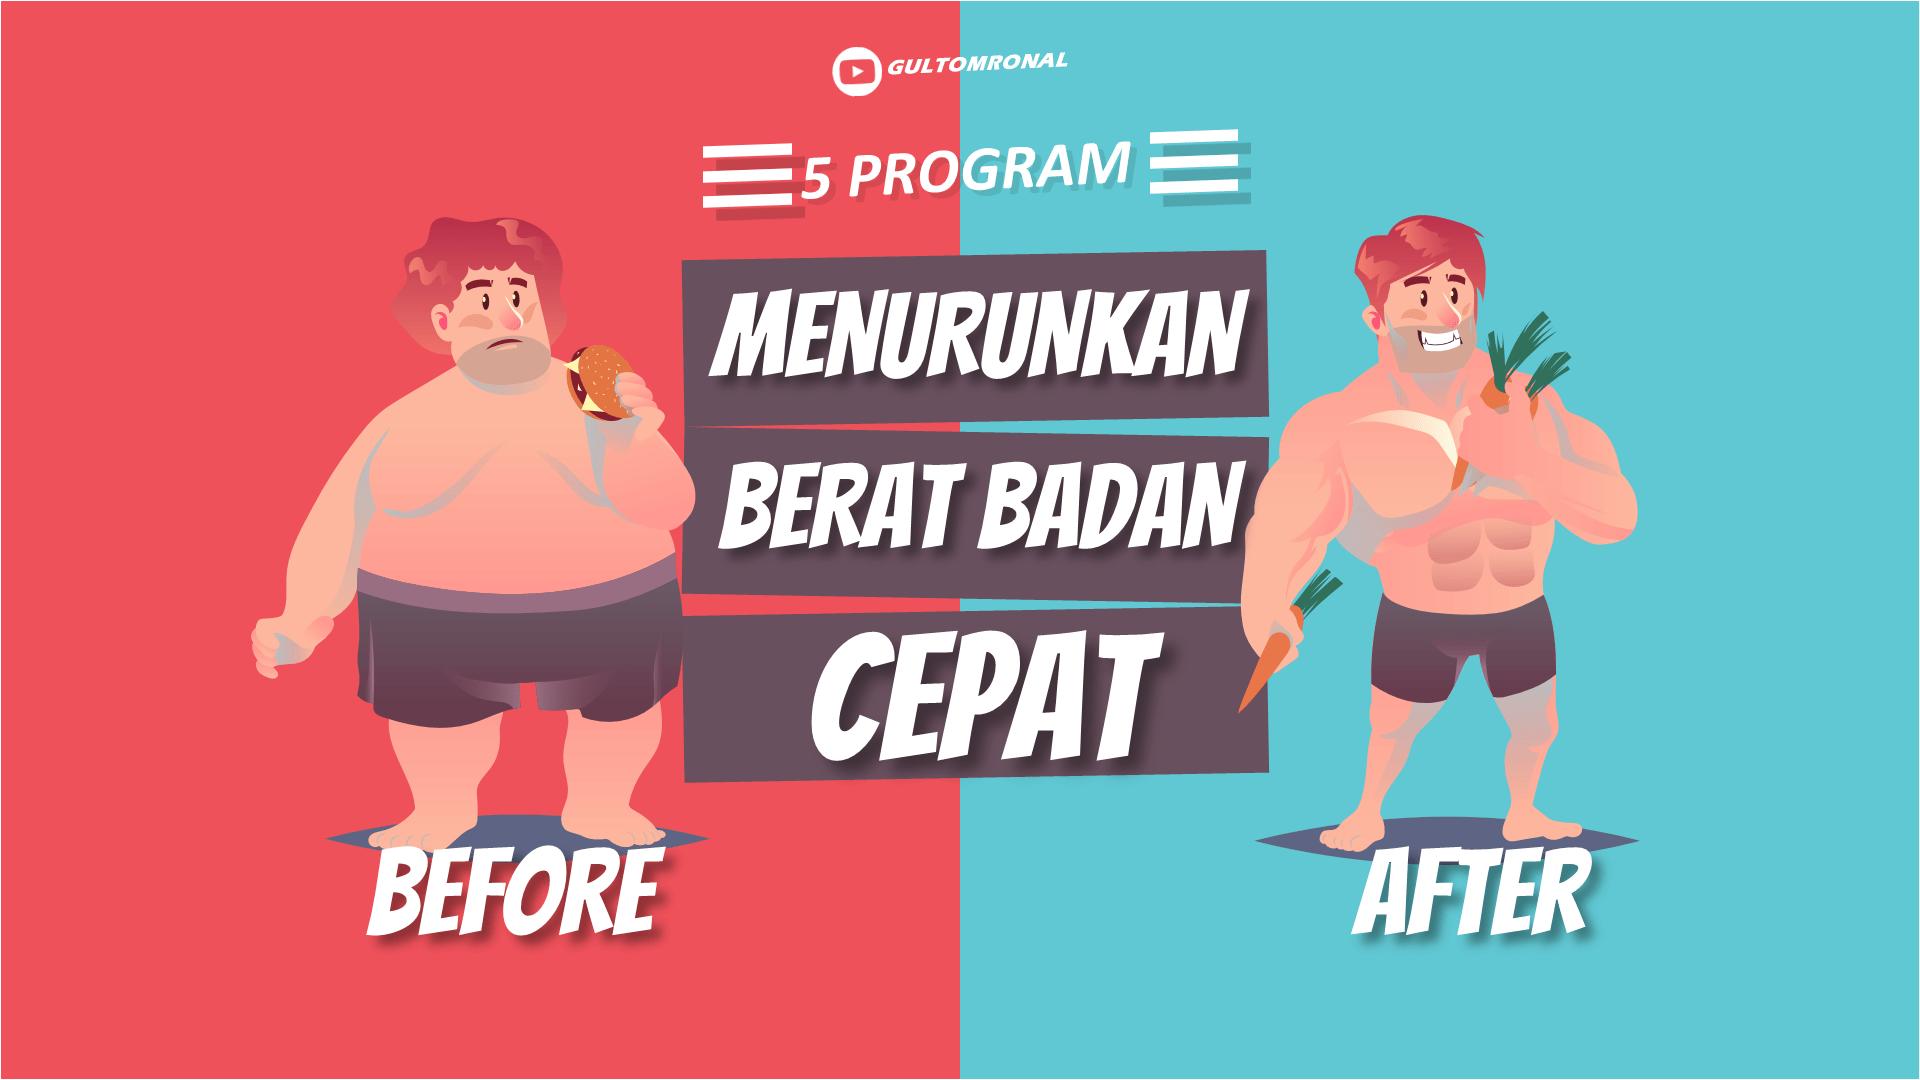 5 Program Menurunkan  Berat badan Dengan Cepat